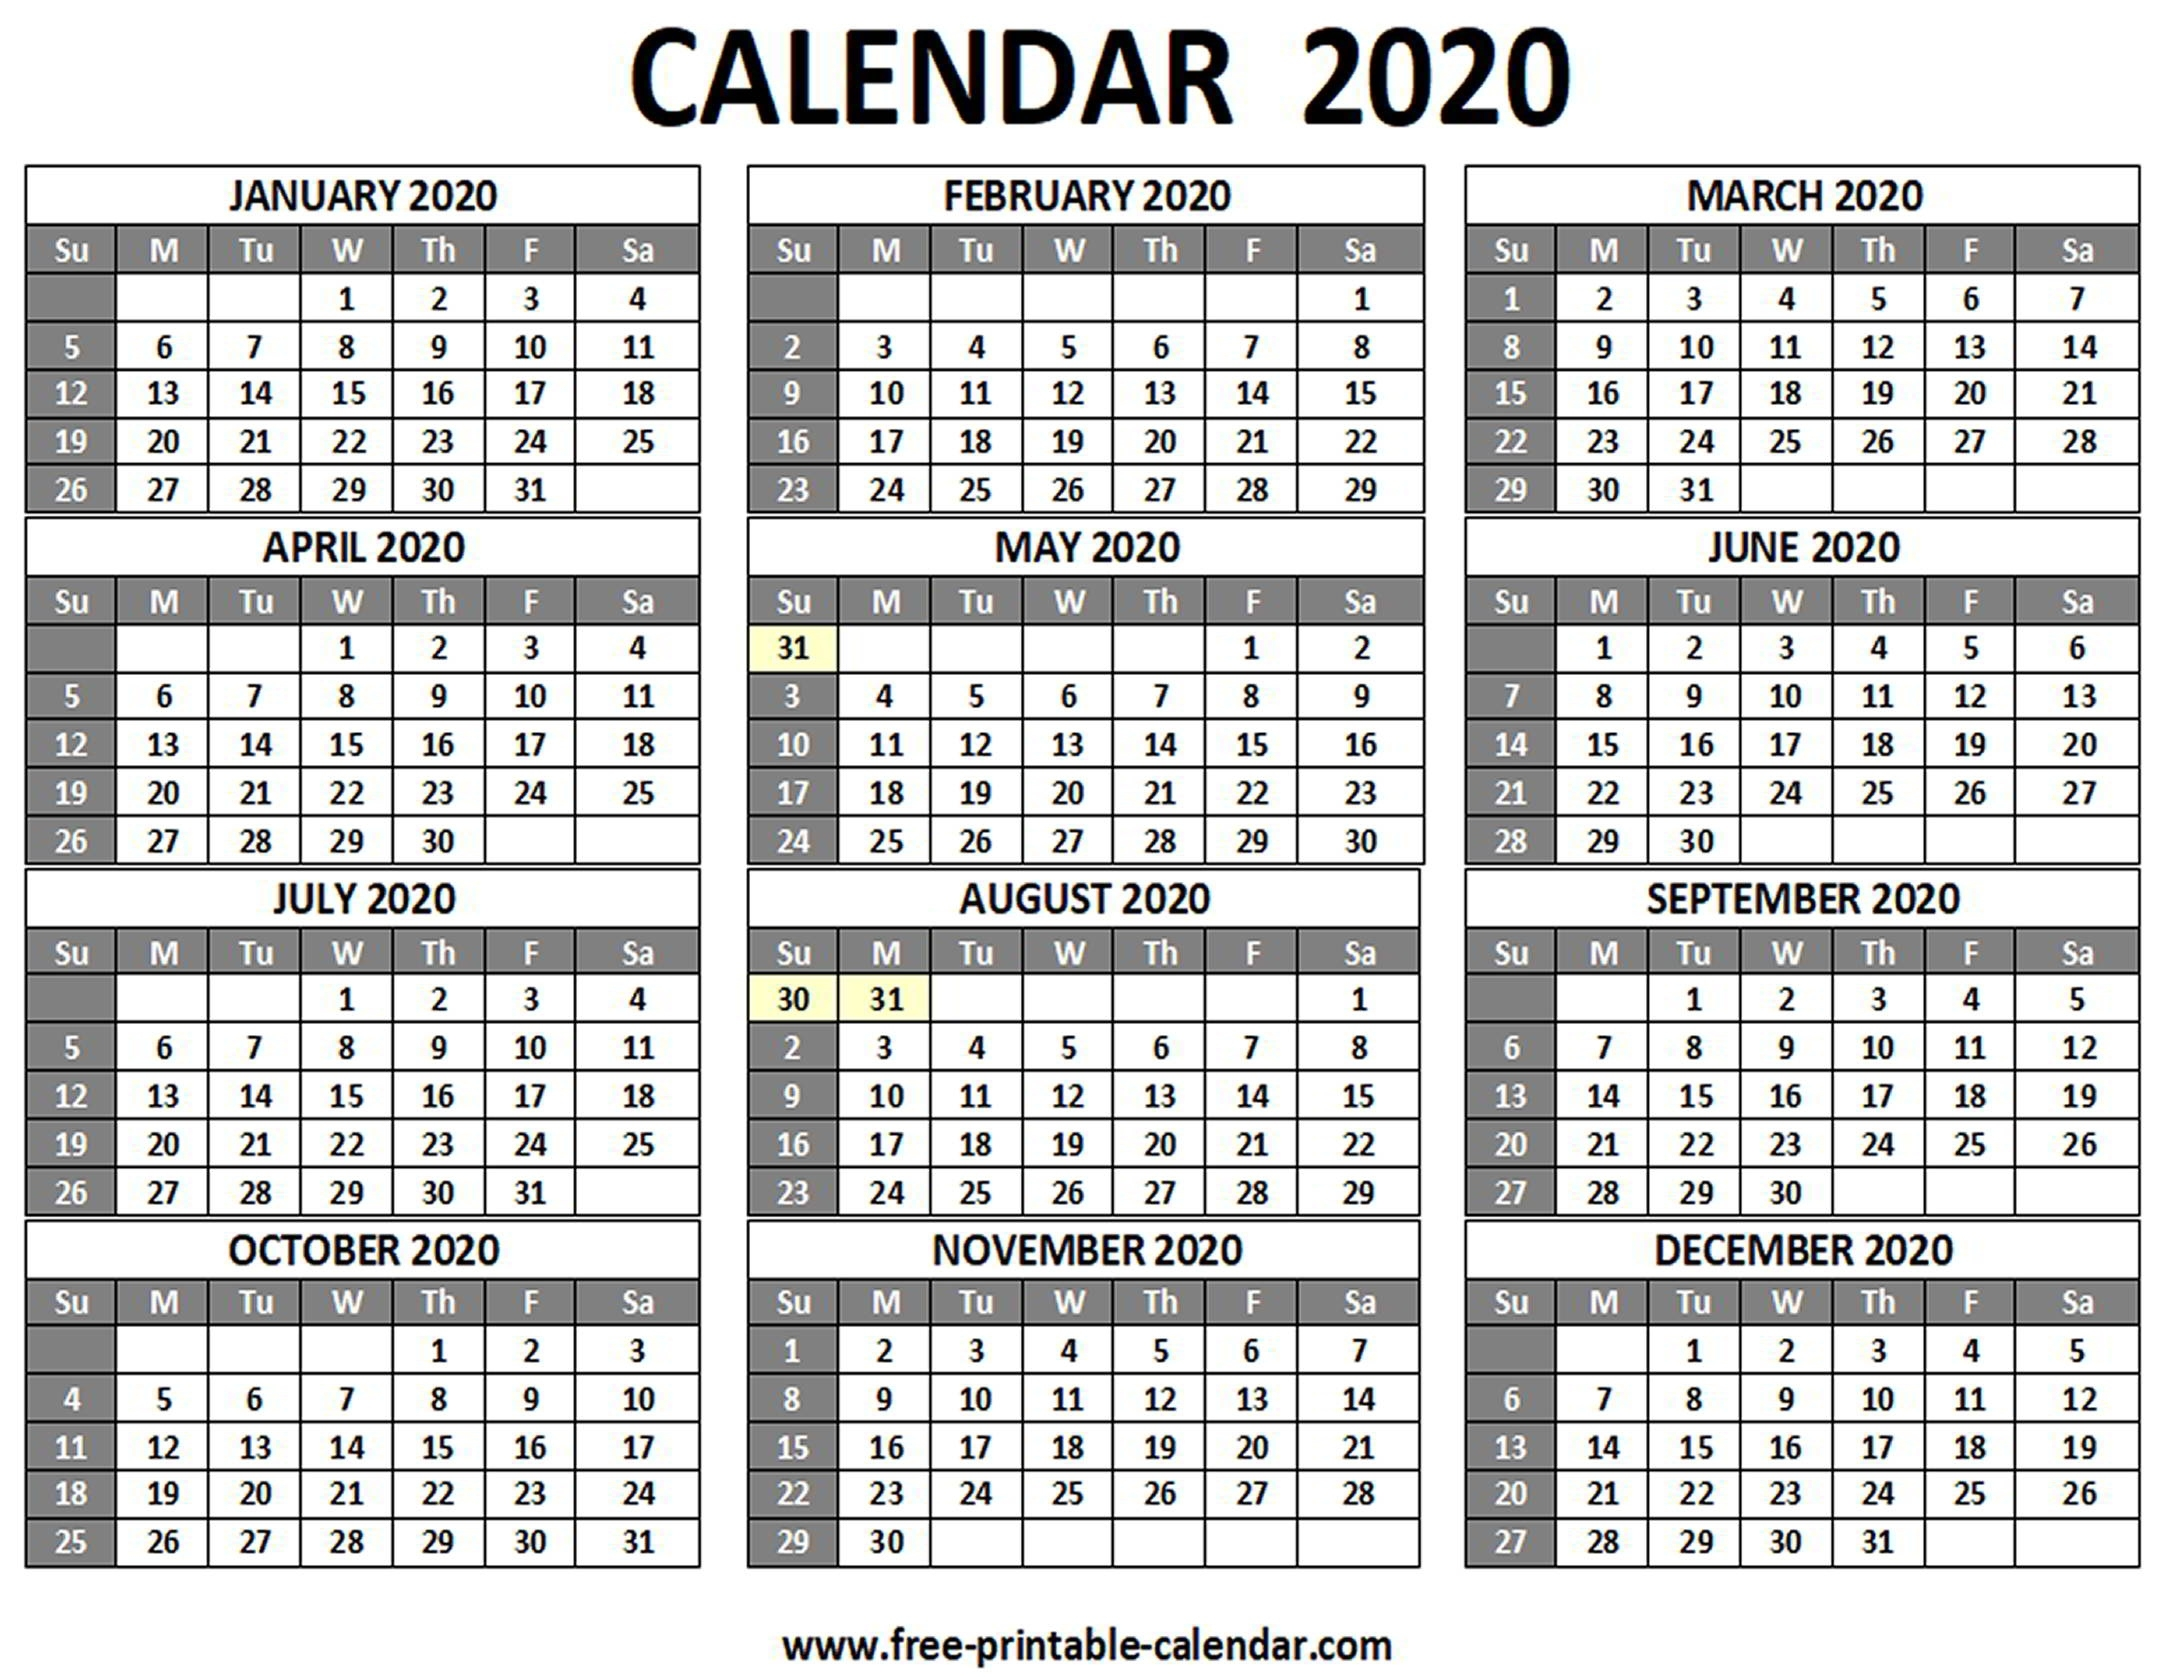 Printable 2020 Calendar - Free-Printable-Calendar Extraordinary Free Printable 2 Page Calendar 2020